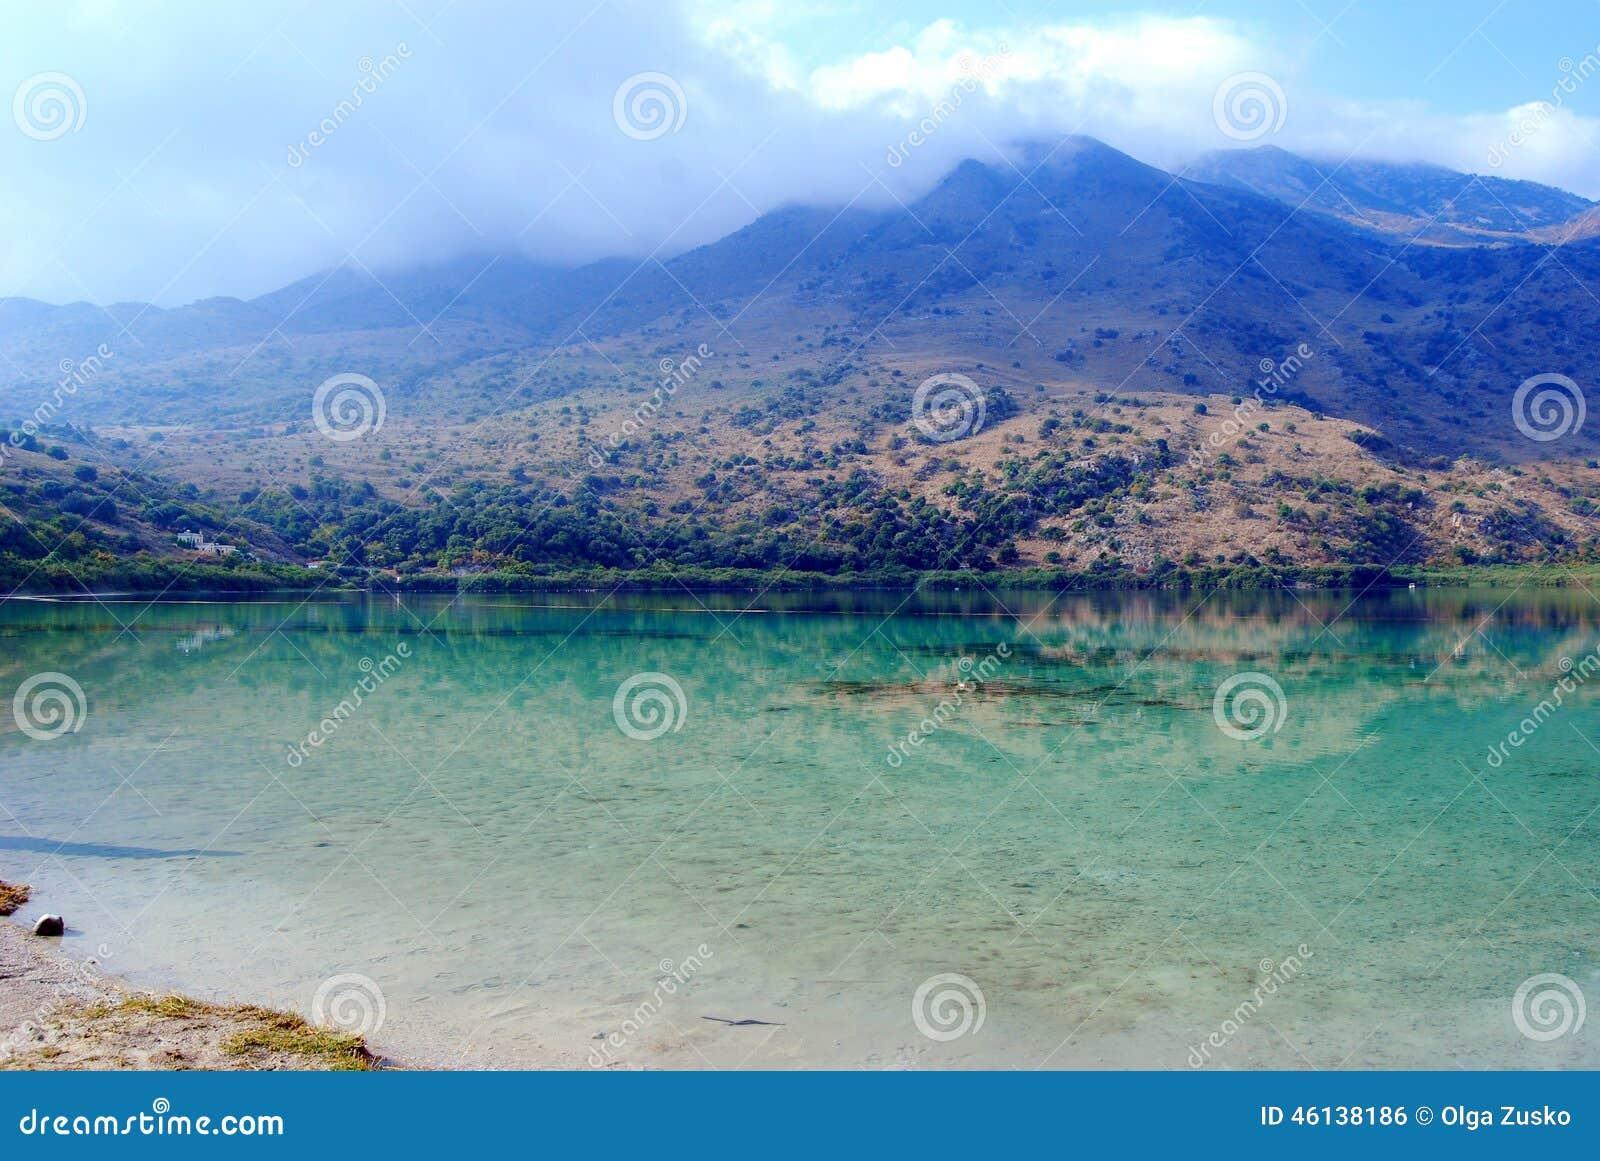 Lac Kournas, île de Crète